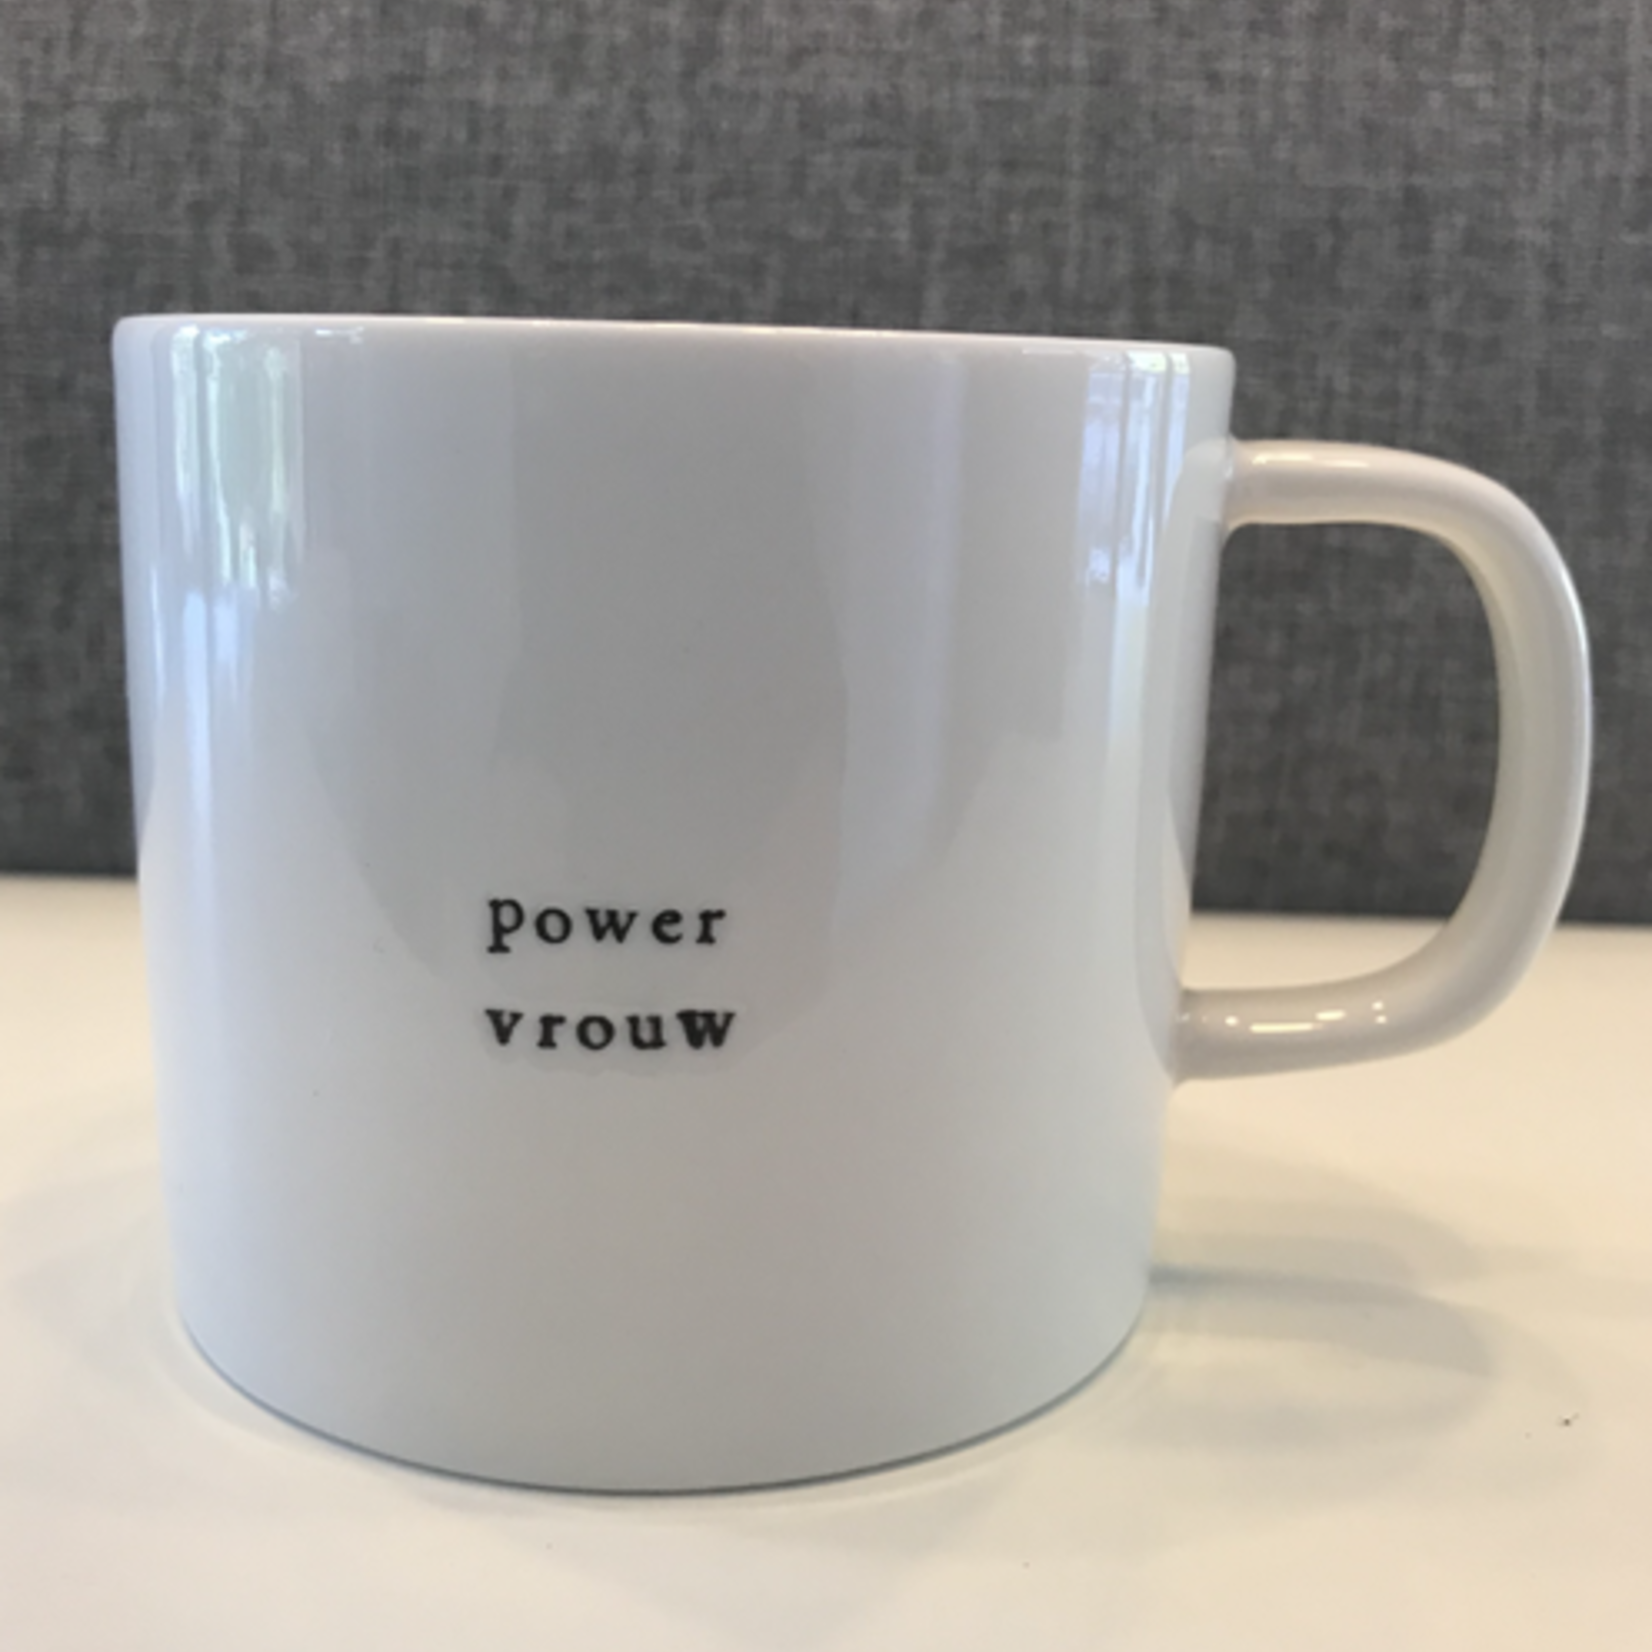 Koffiemok - Powervrouw - Wit